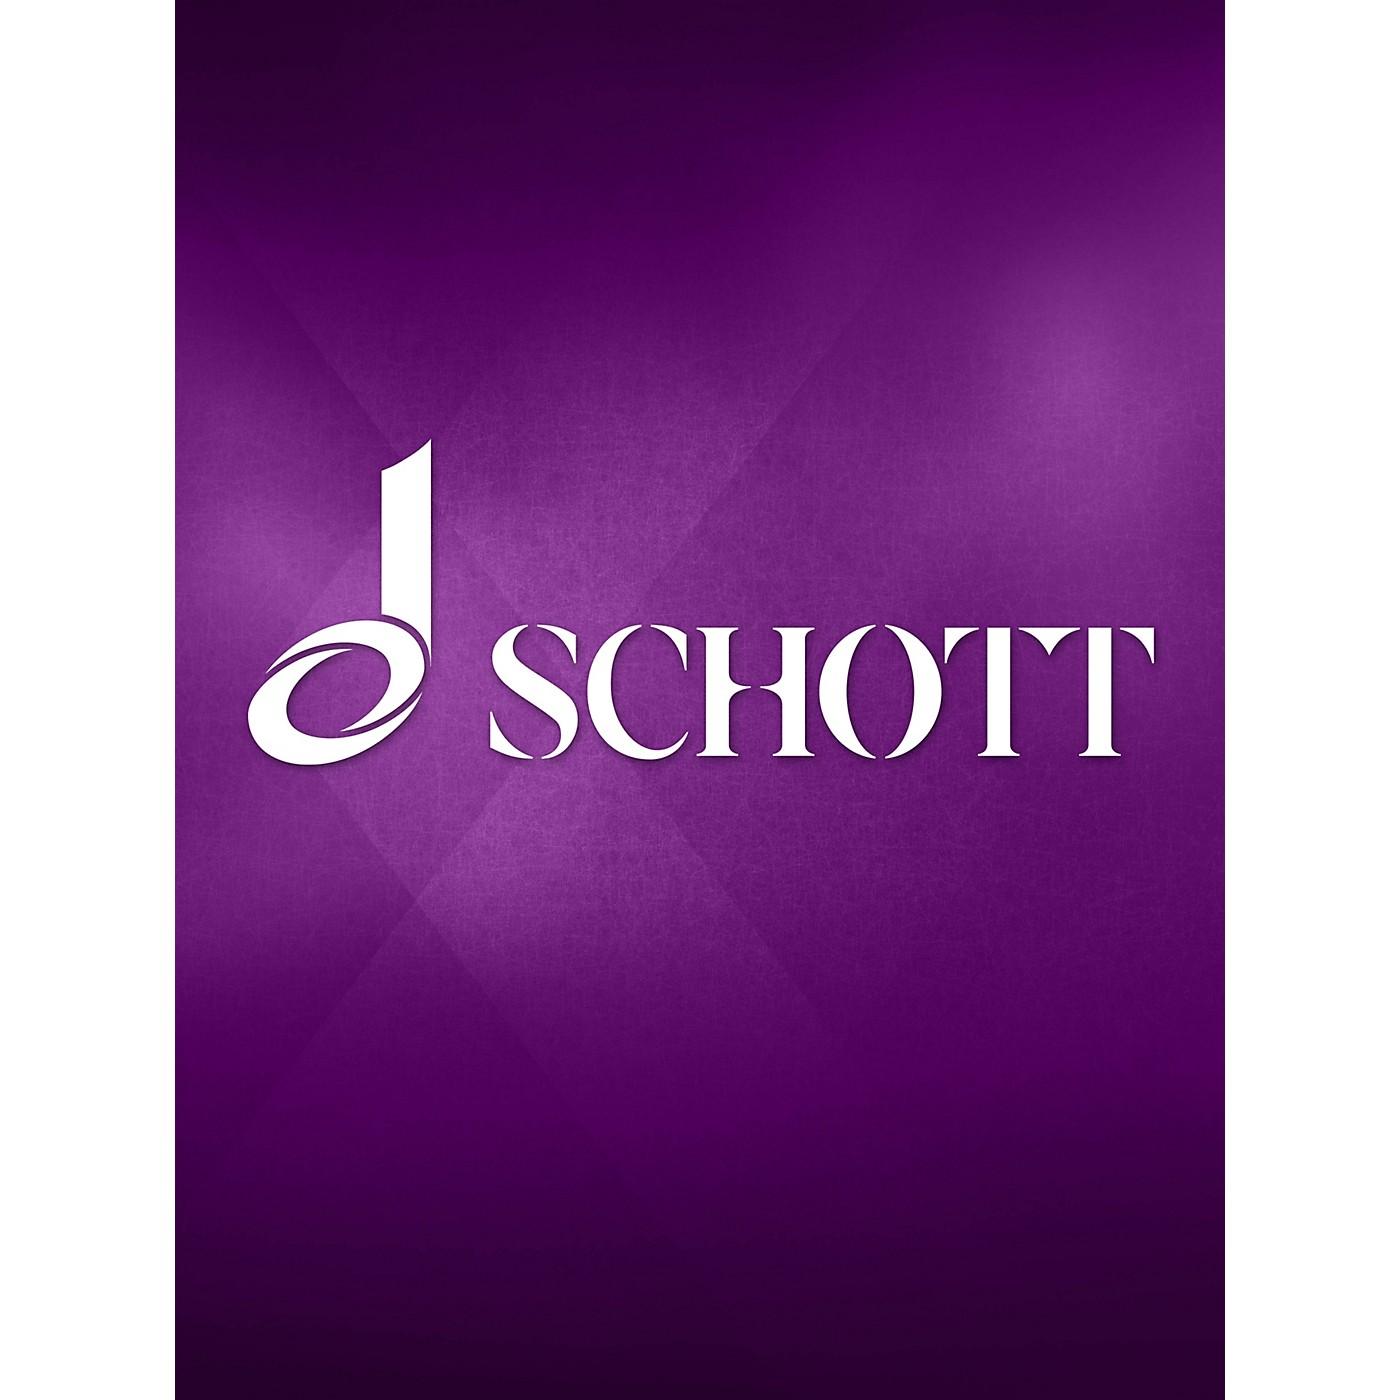 Eulenburg Concerto Grosso in G Major Op. 3, No. 3 (Solo Violin Part) Schott Series by Georg Friedrich Händel thumbnail